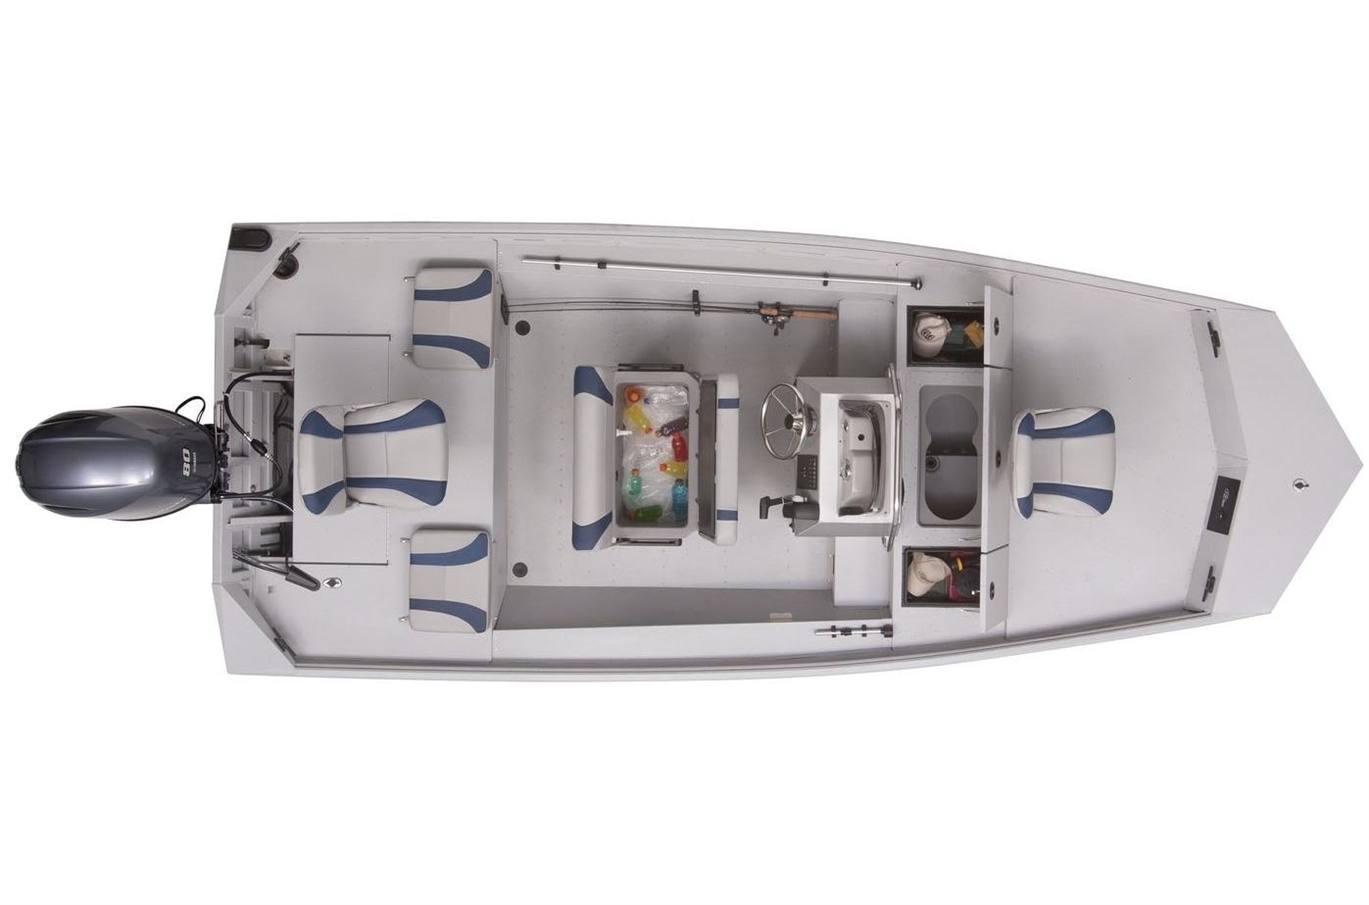 2020 g3 gator tough 17 ccj dlx (jet tunnel hull)